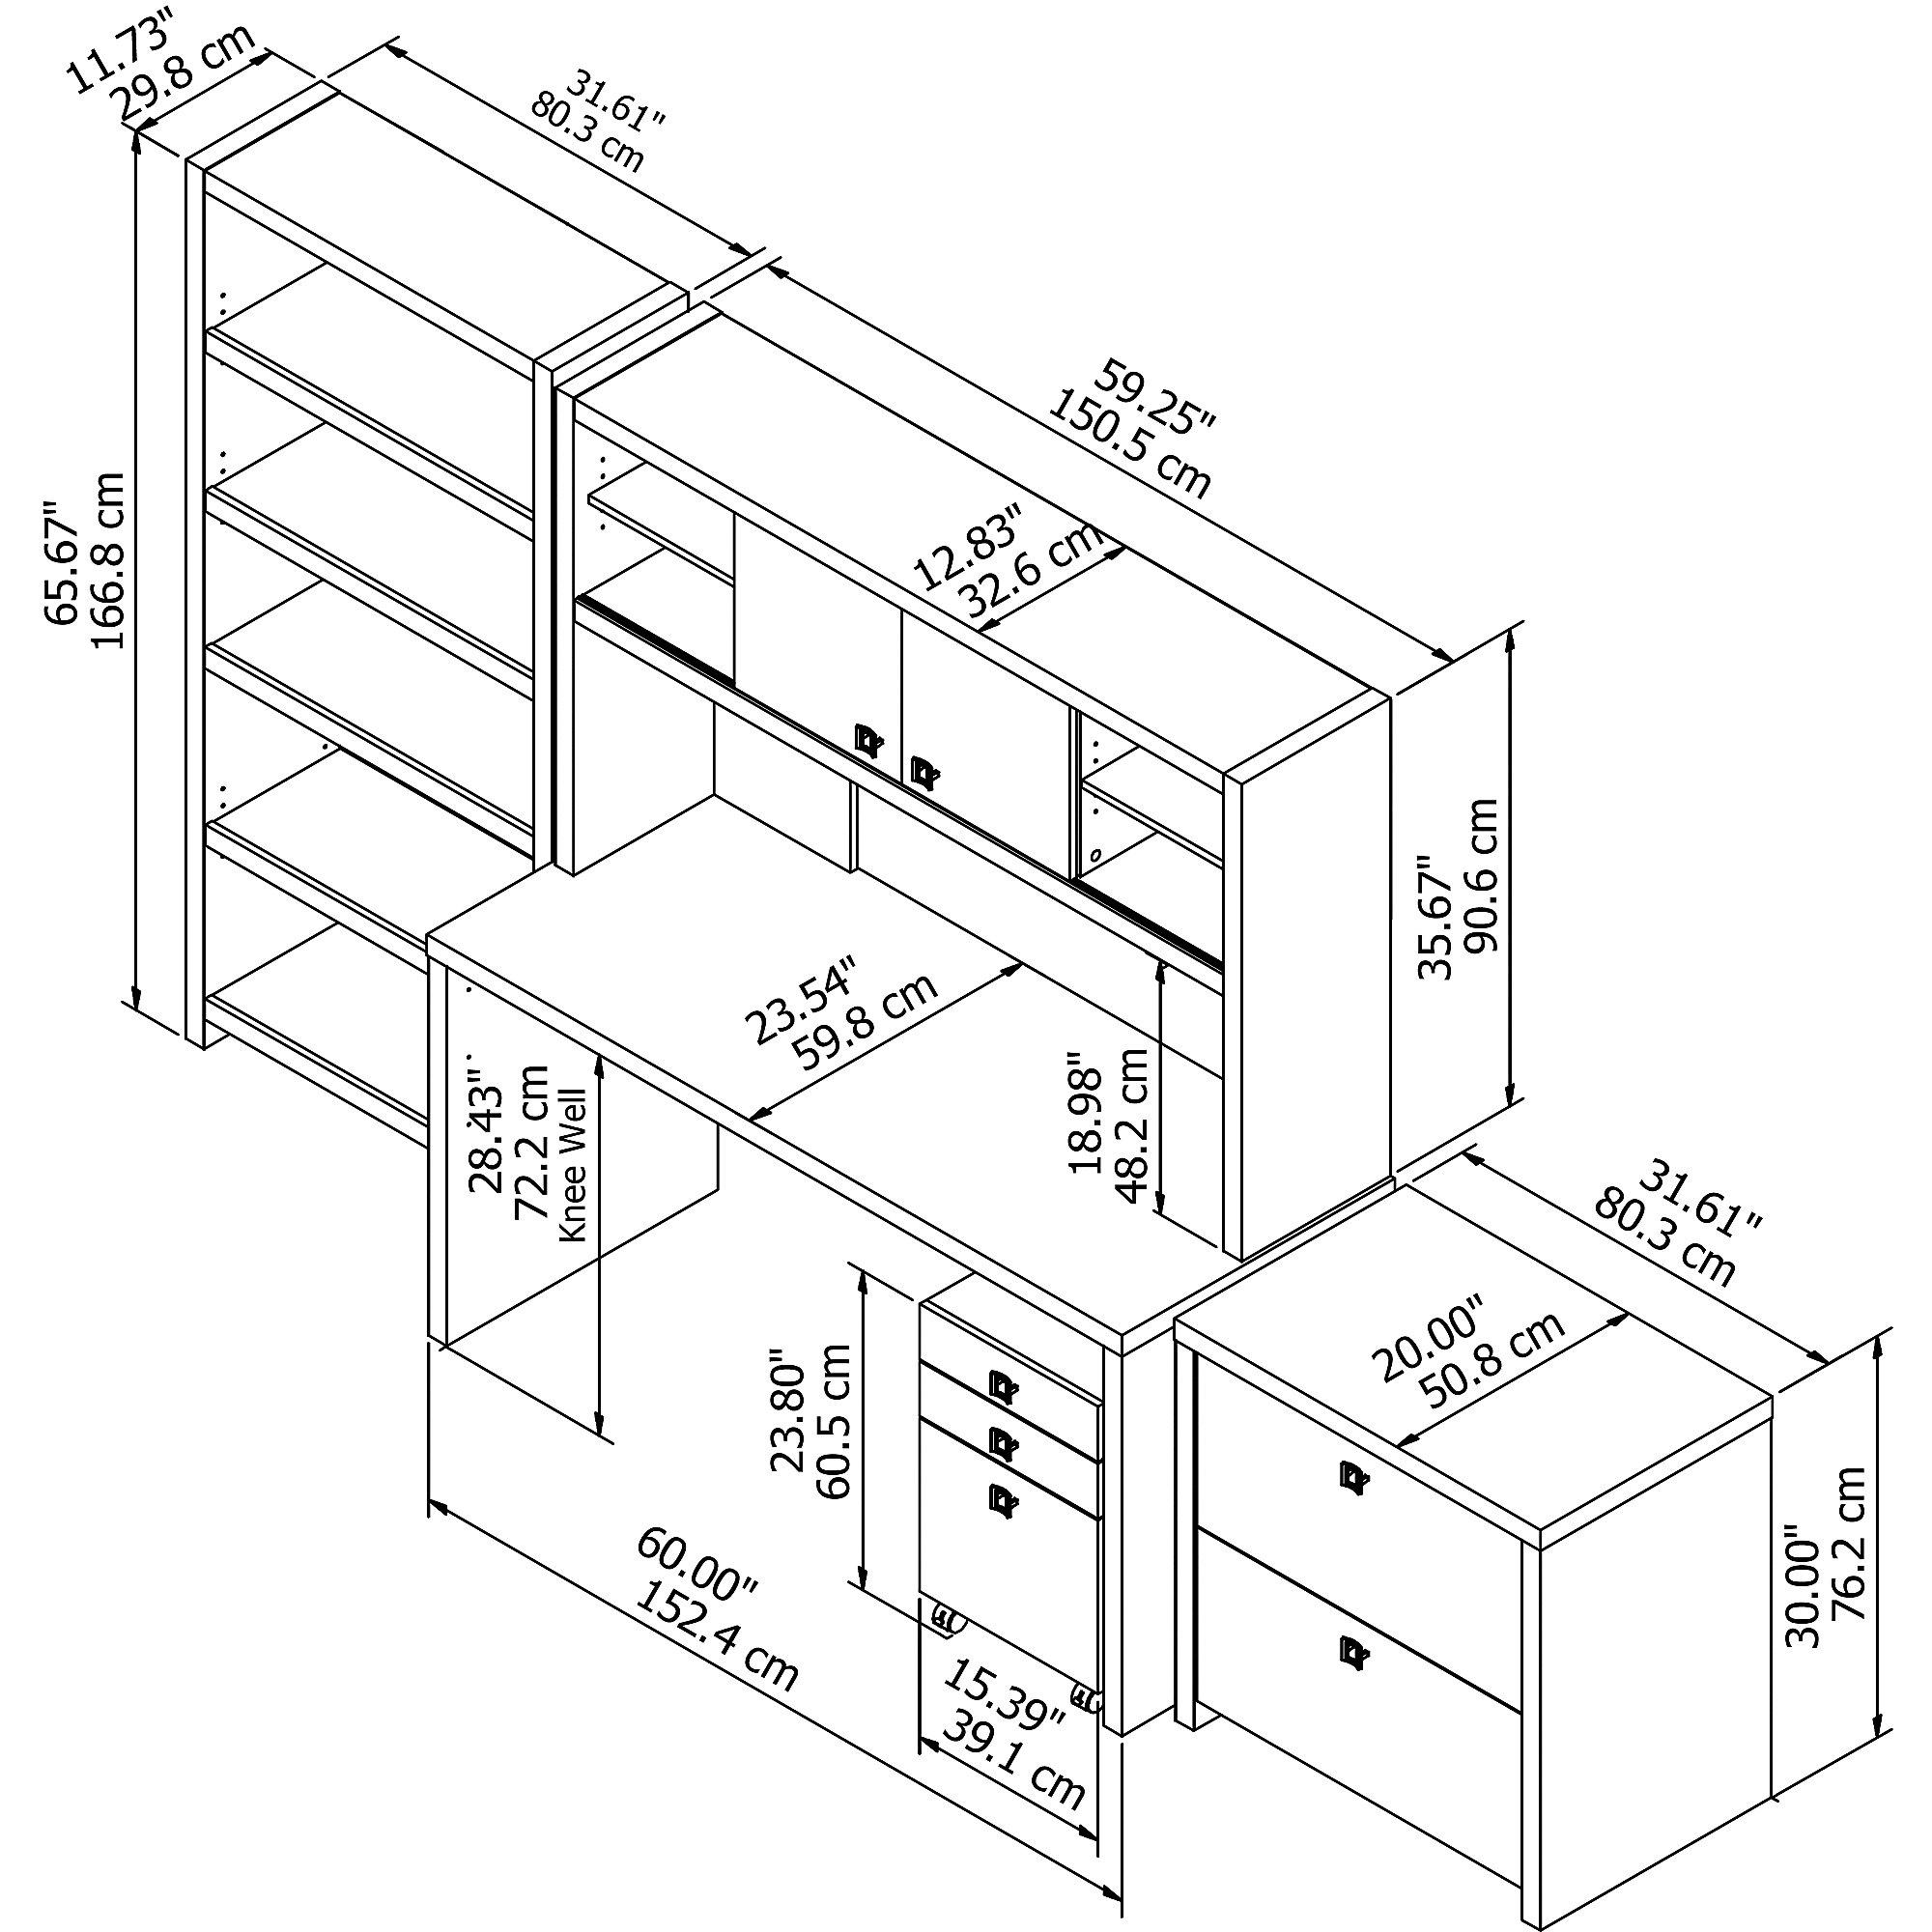 ech027 dimensions